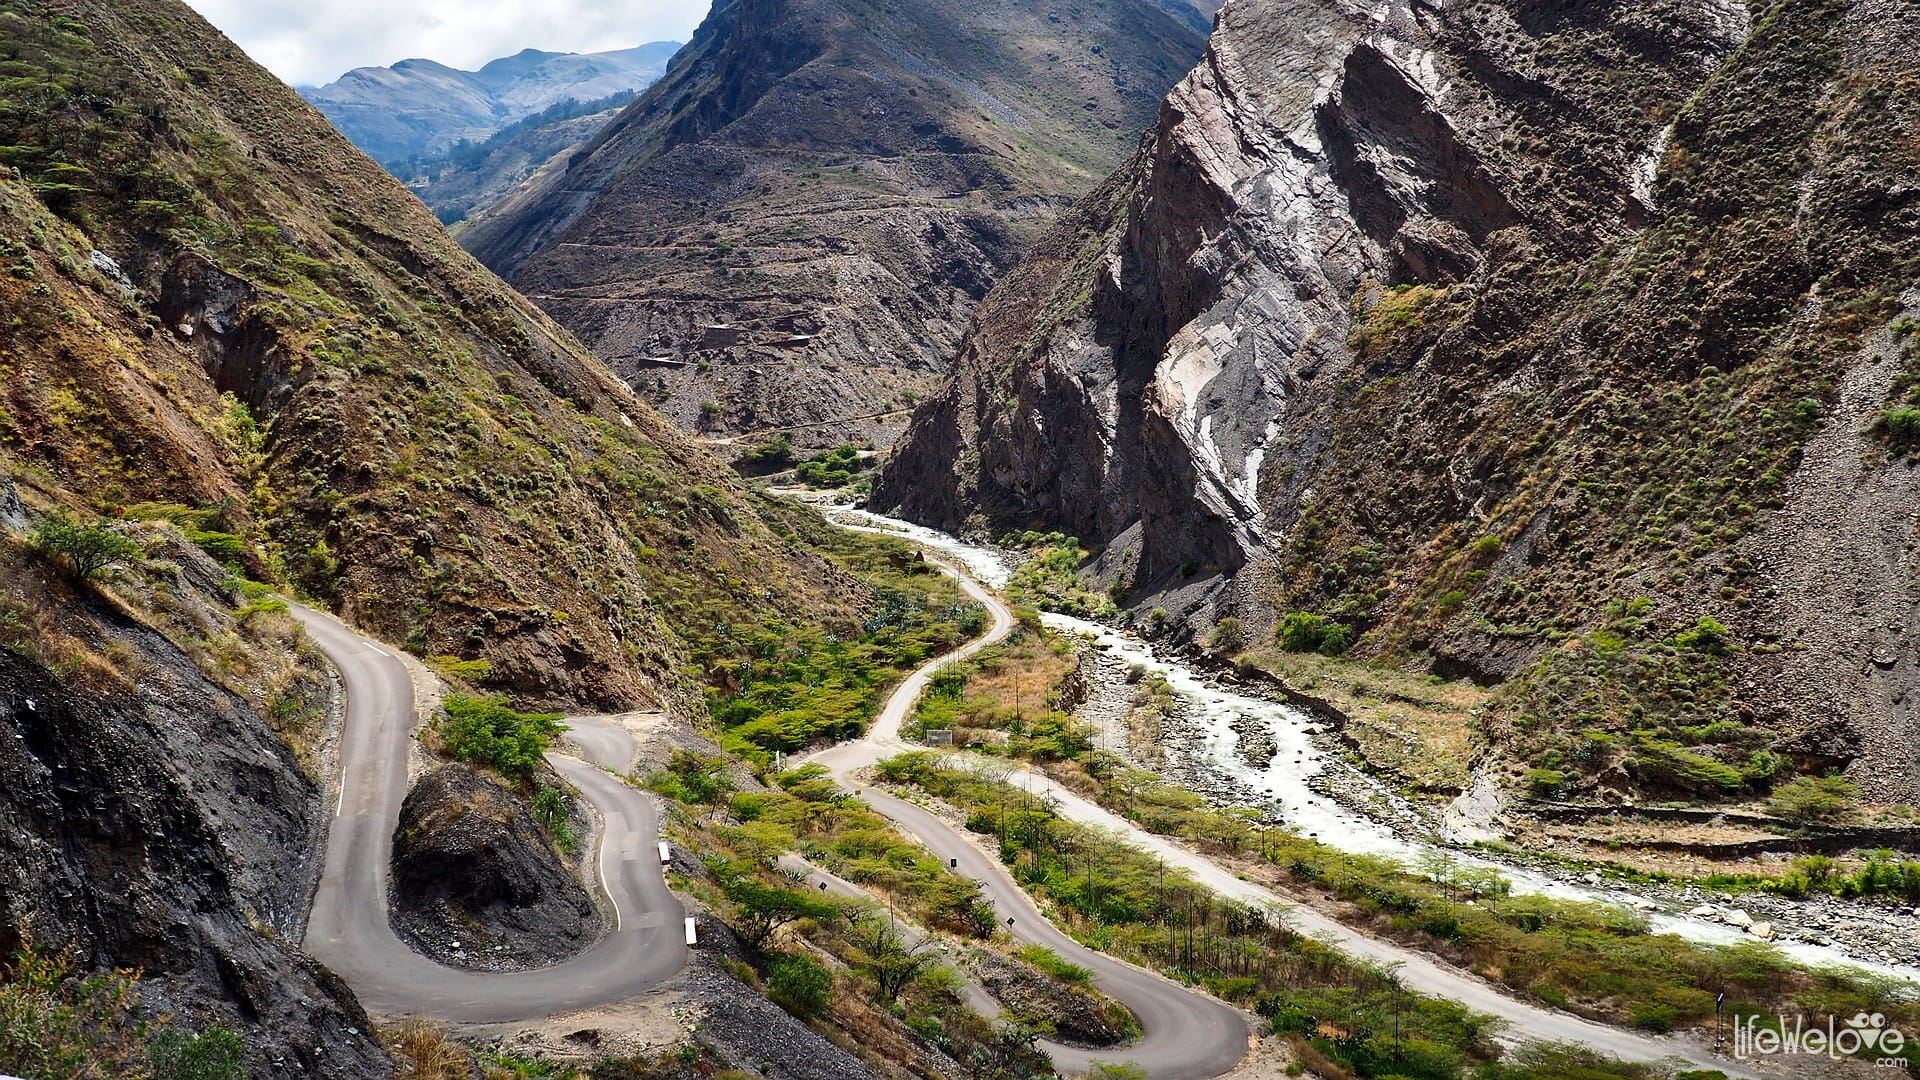 Trasy motocyklowe w Peru - Mollepata do Pallasca